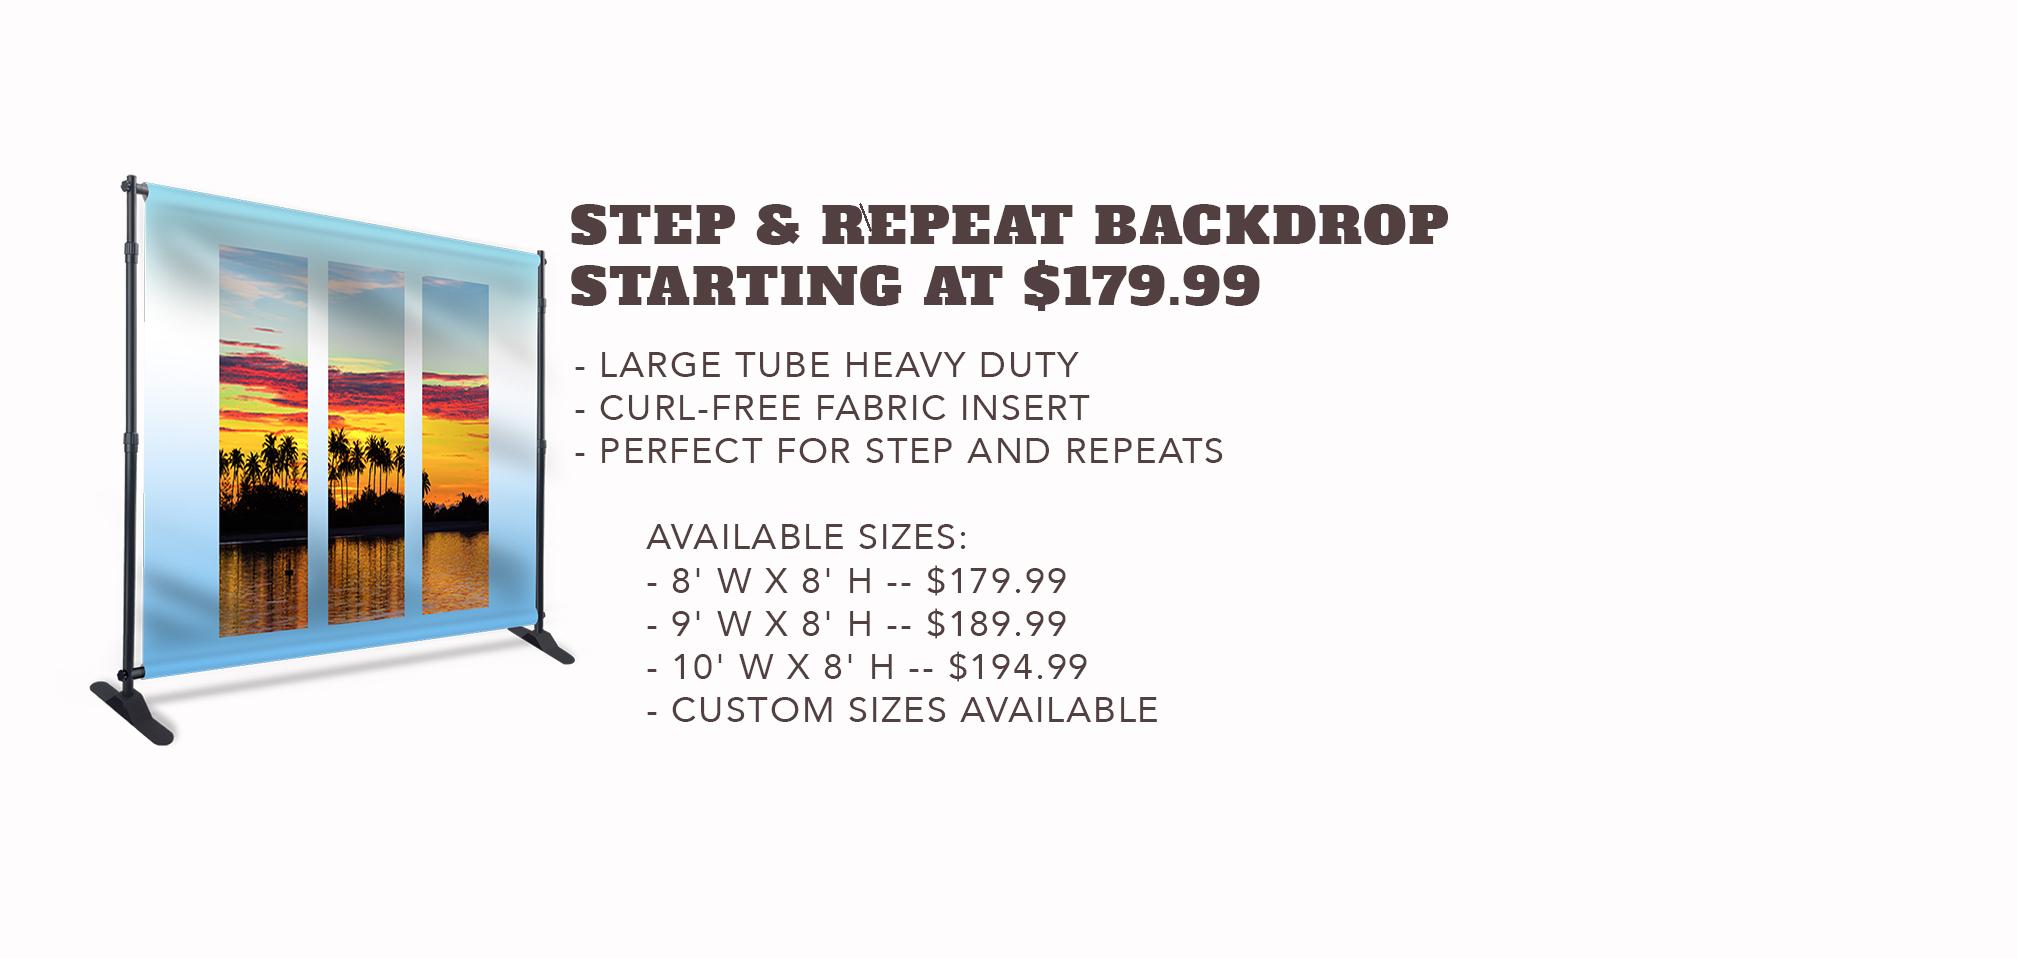 Step & Repeat Backdrop - Starting at $179.99